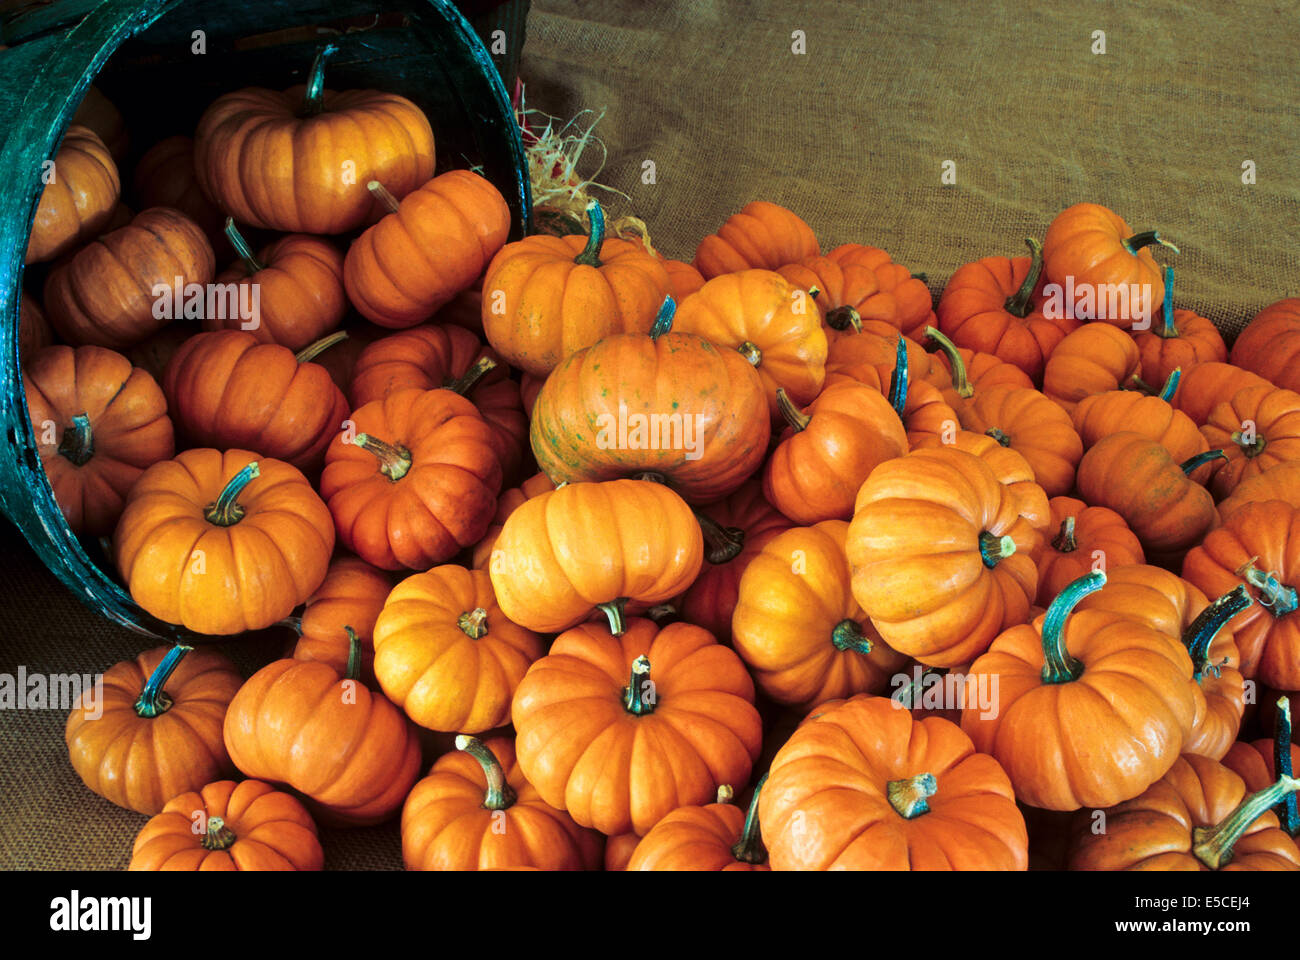 Harvest basket full of orange mini fall pumpkins close up on a farm in Lancaster County, Pennsylvania, USA - Stock Image